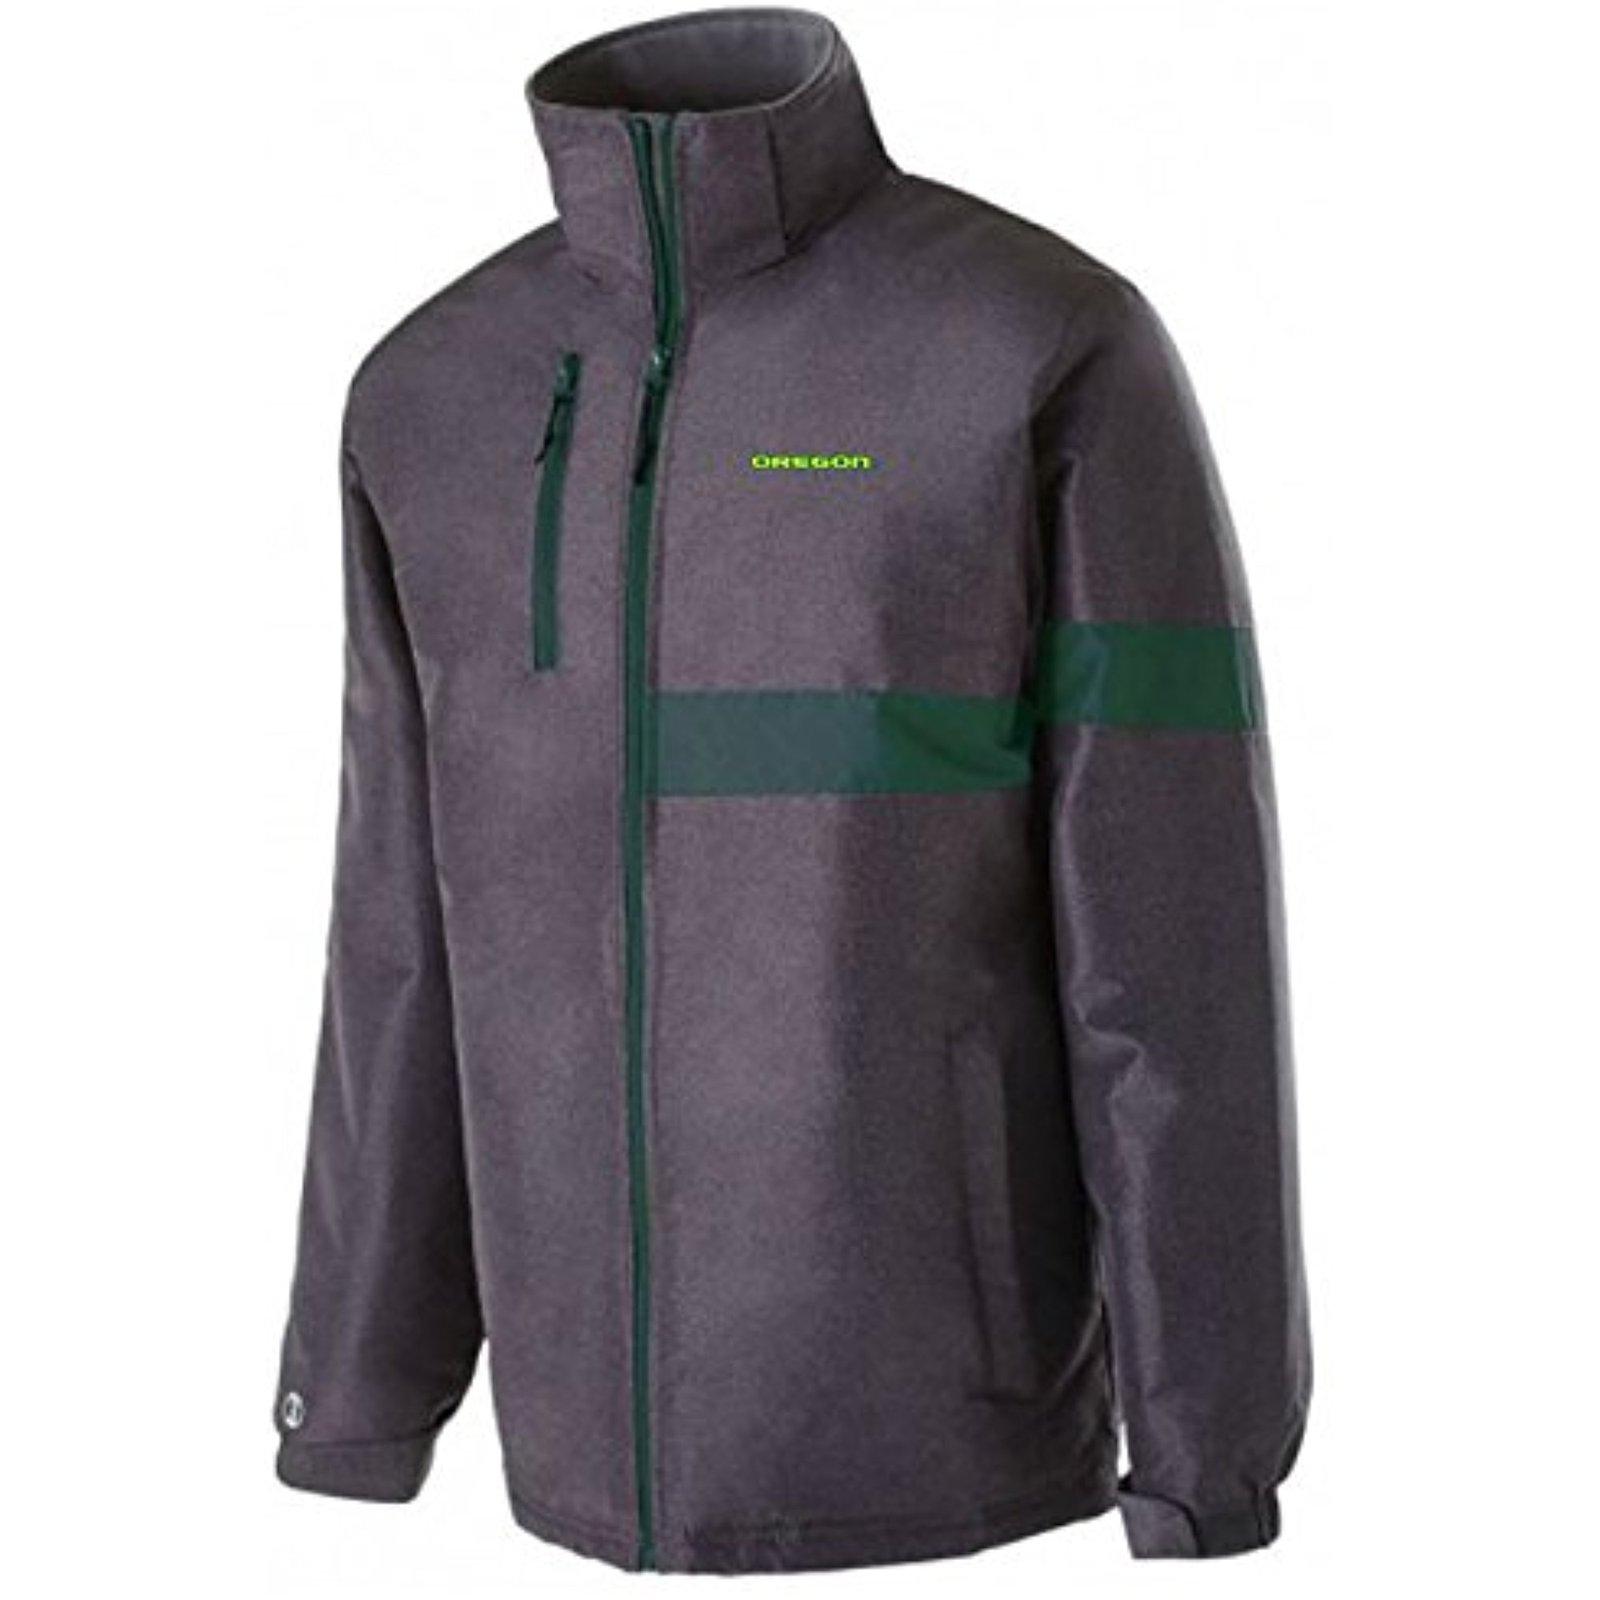 NCAA Oregon Ducks Men's Raider Jacket, Medium, Carbon Print/Dark Green